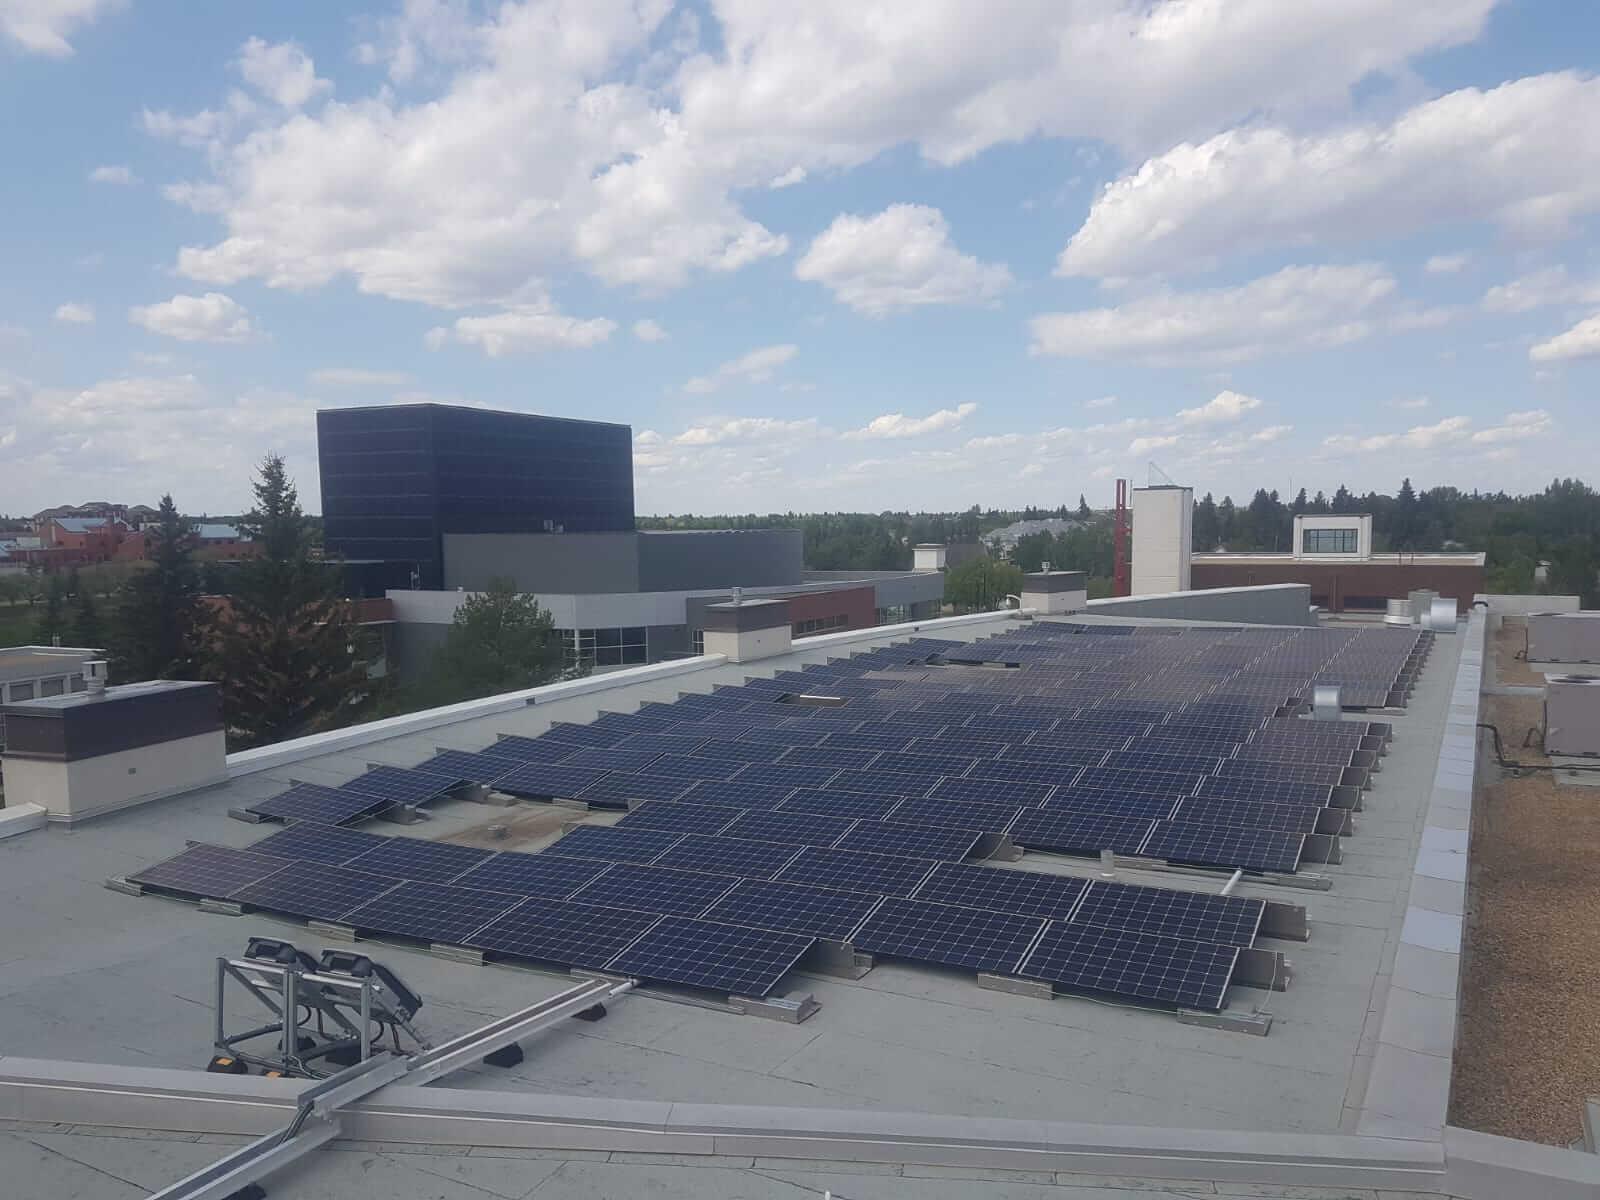 U of A Aug solar panels camrose